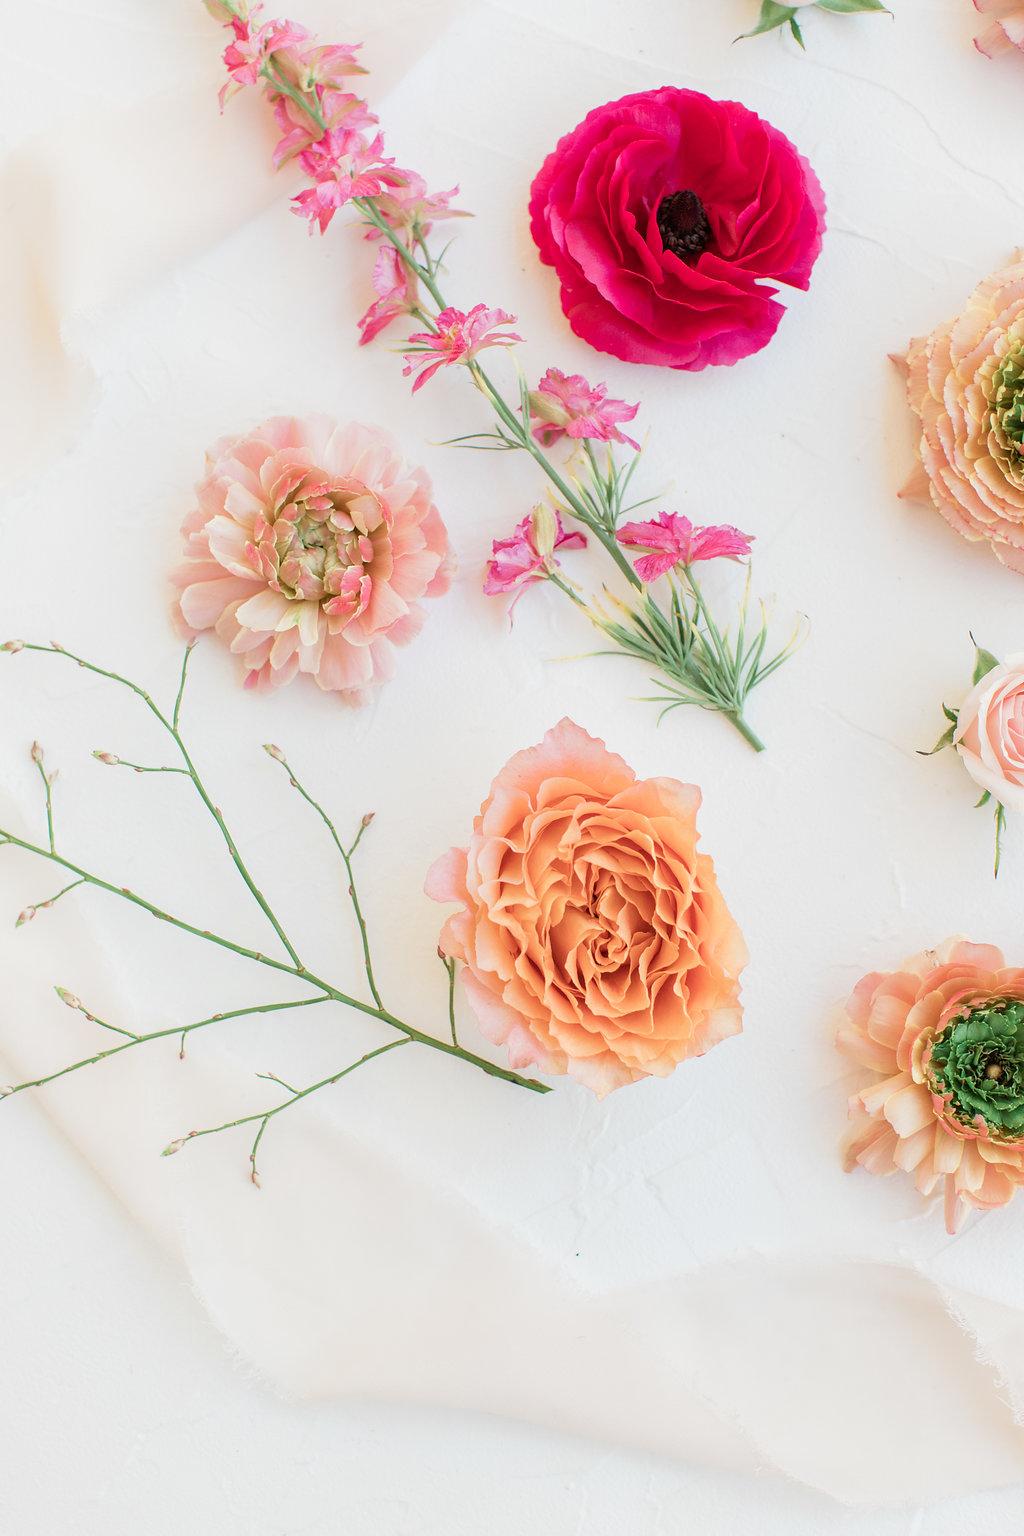 Floral Silk Ribbon aesthetic flatlay for instagram